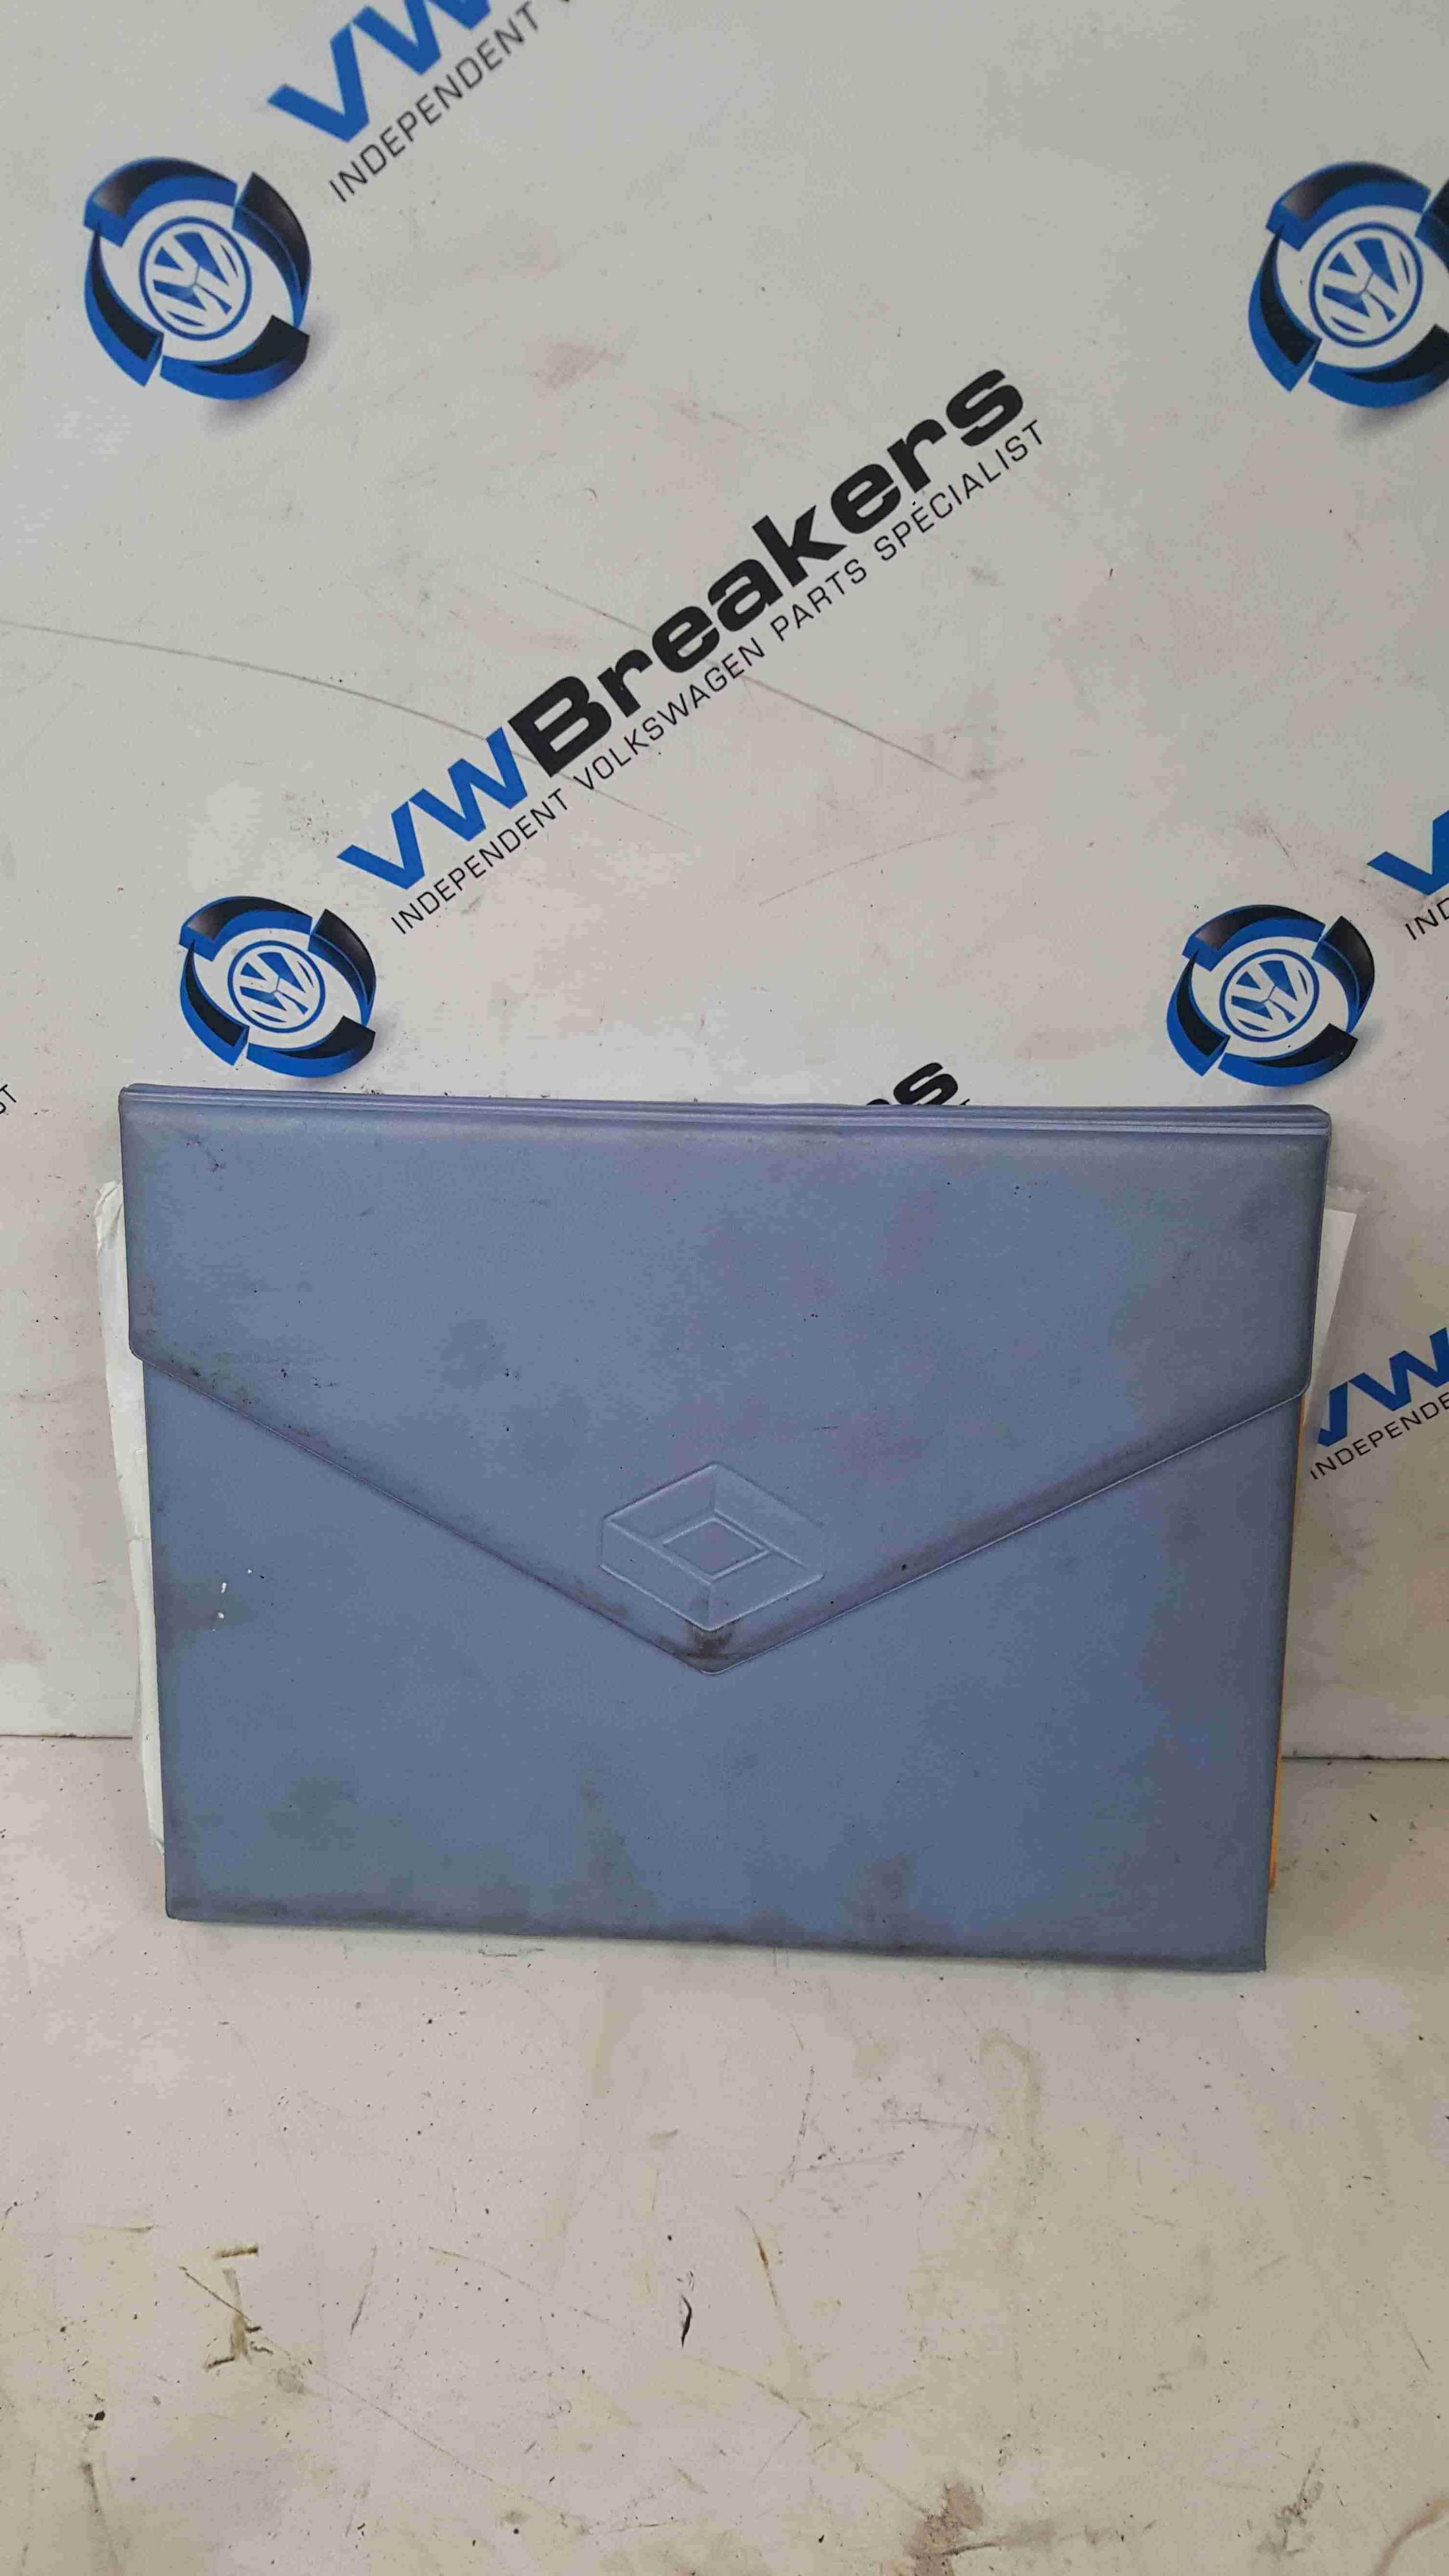 Renault Scenic MK2 2003-2009 Document Wallet Holder Blue